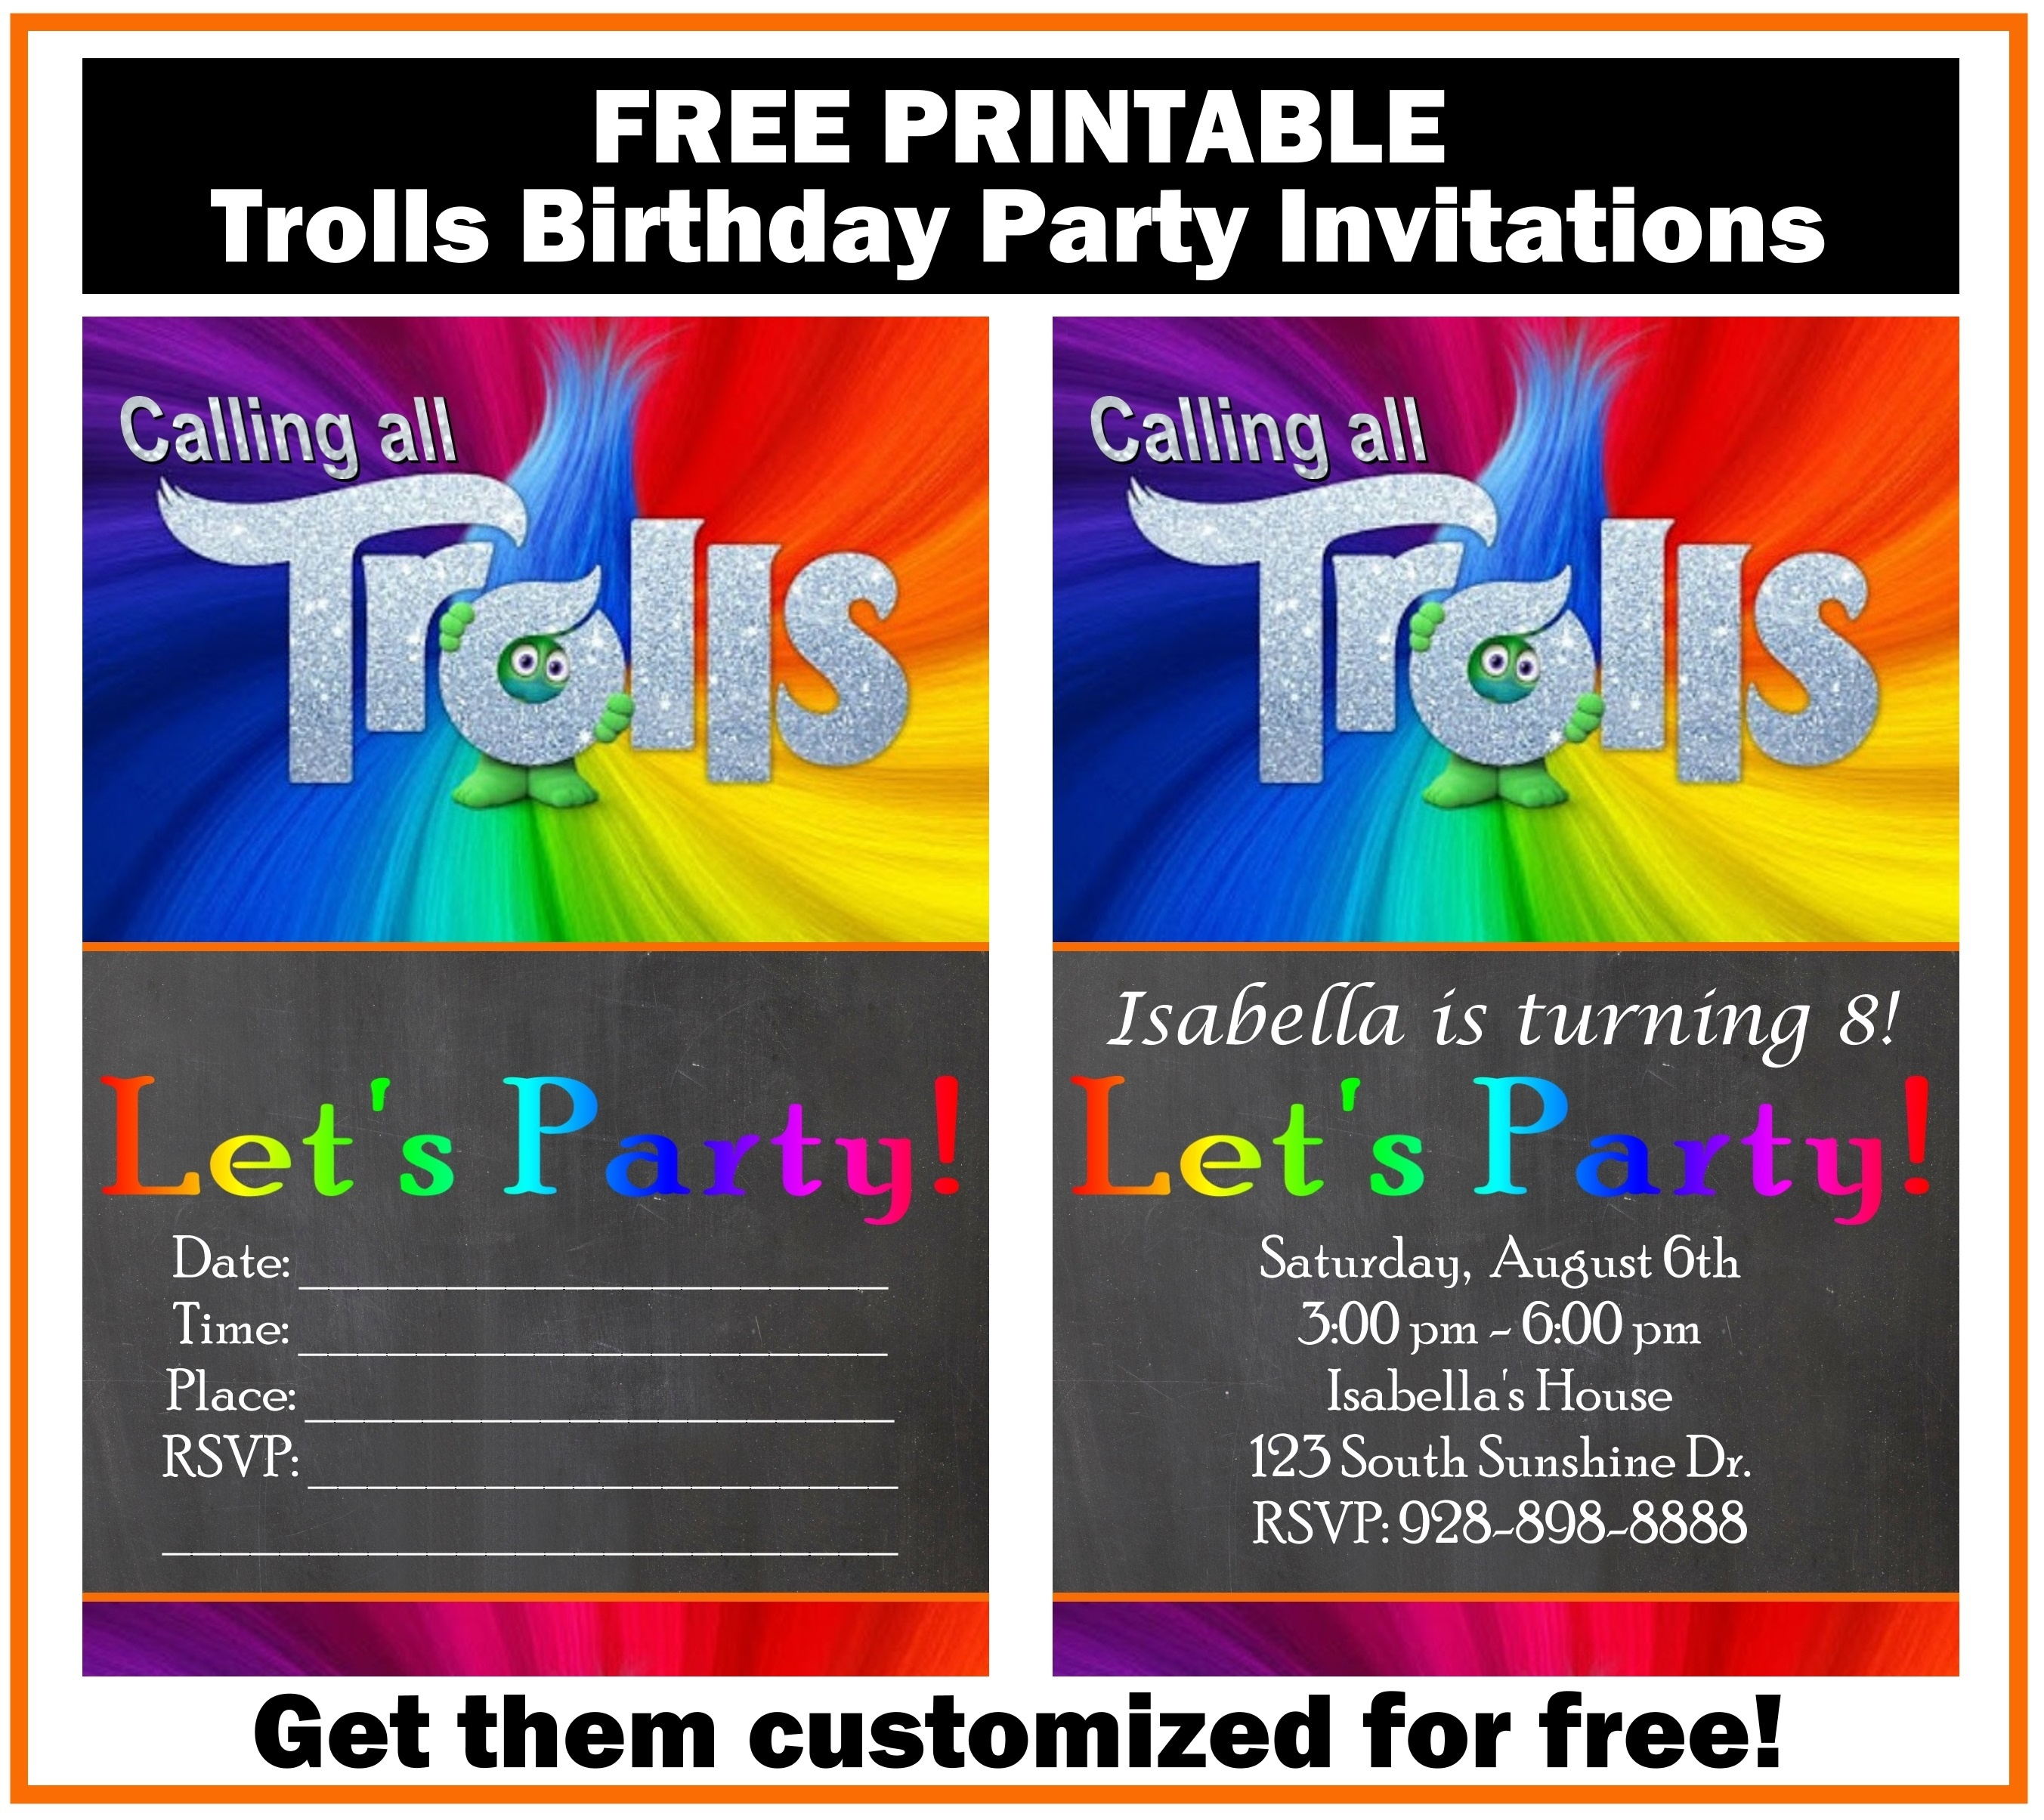 Free Trolls Birthday Party Invitation Printables - Printables 4 Mom - Free Printable Labor Day Invitations